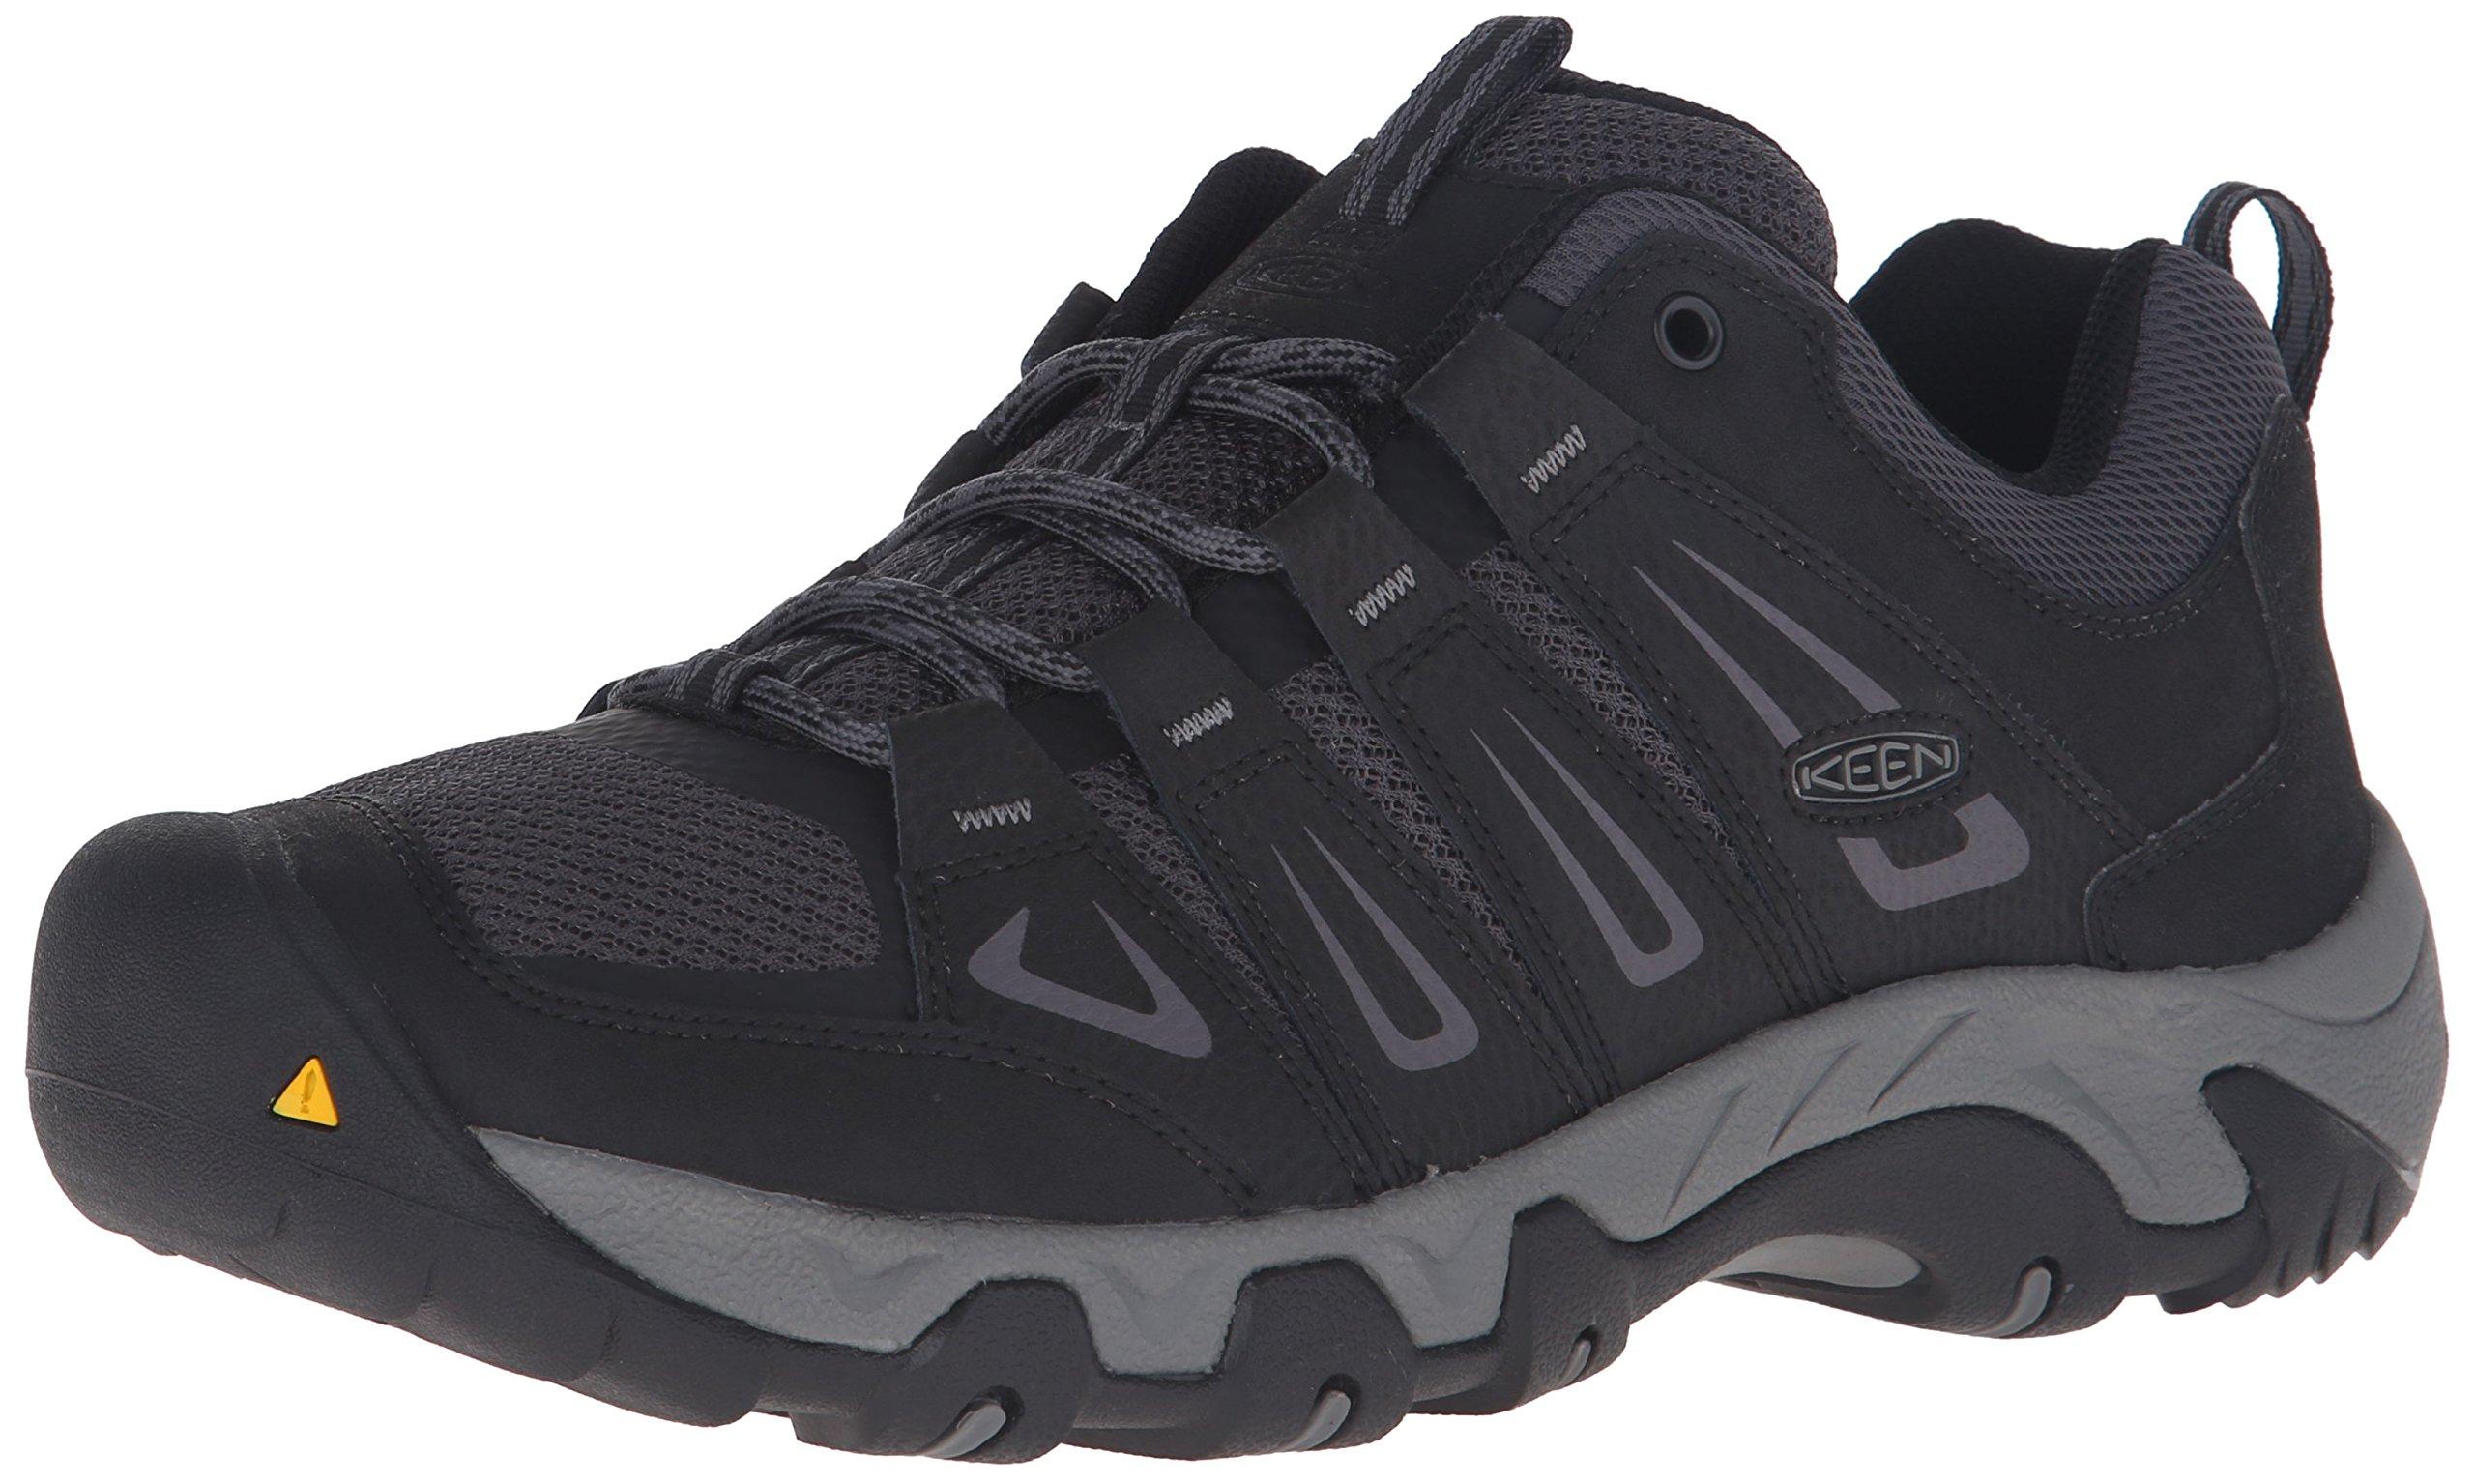 KEEN Men's Oakridge Shoe, Black/Gargoyle, 10 M US